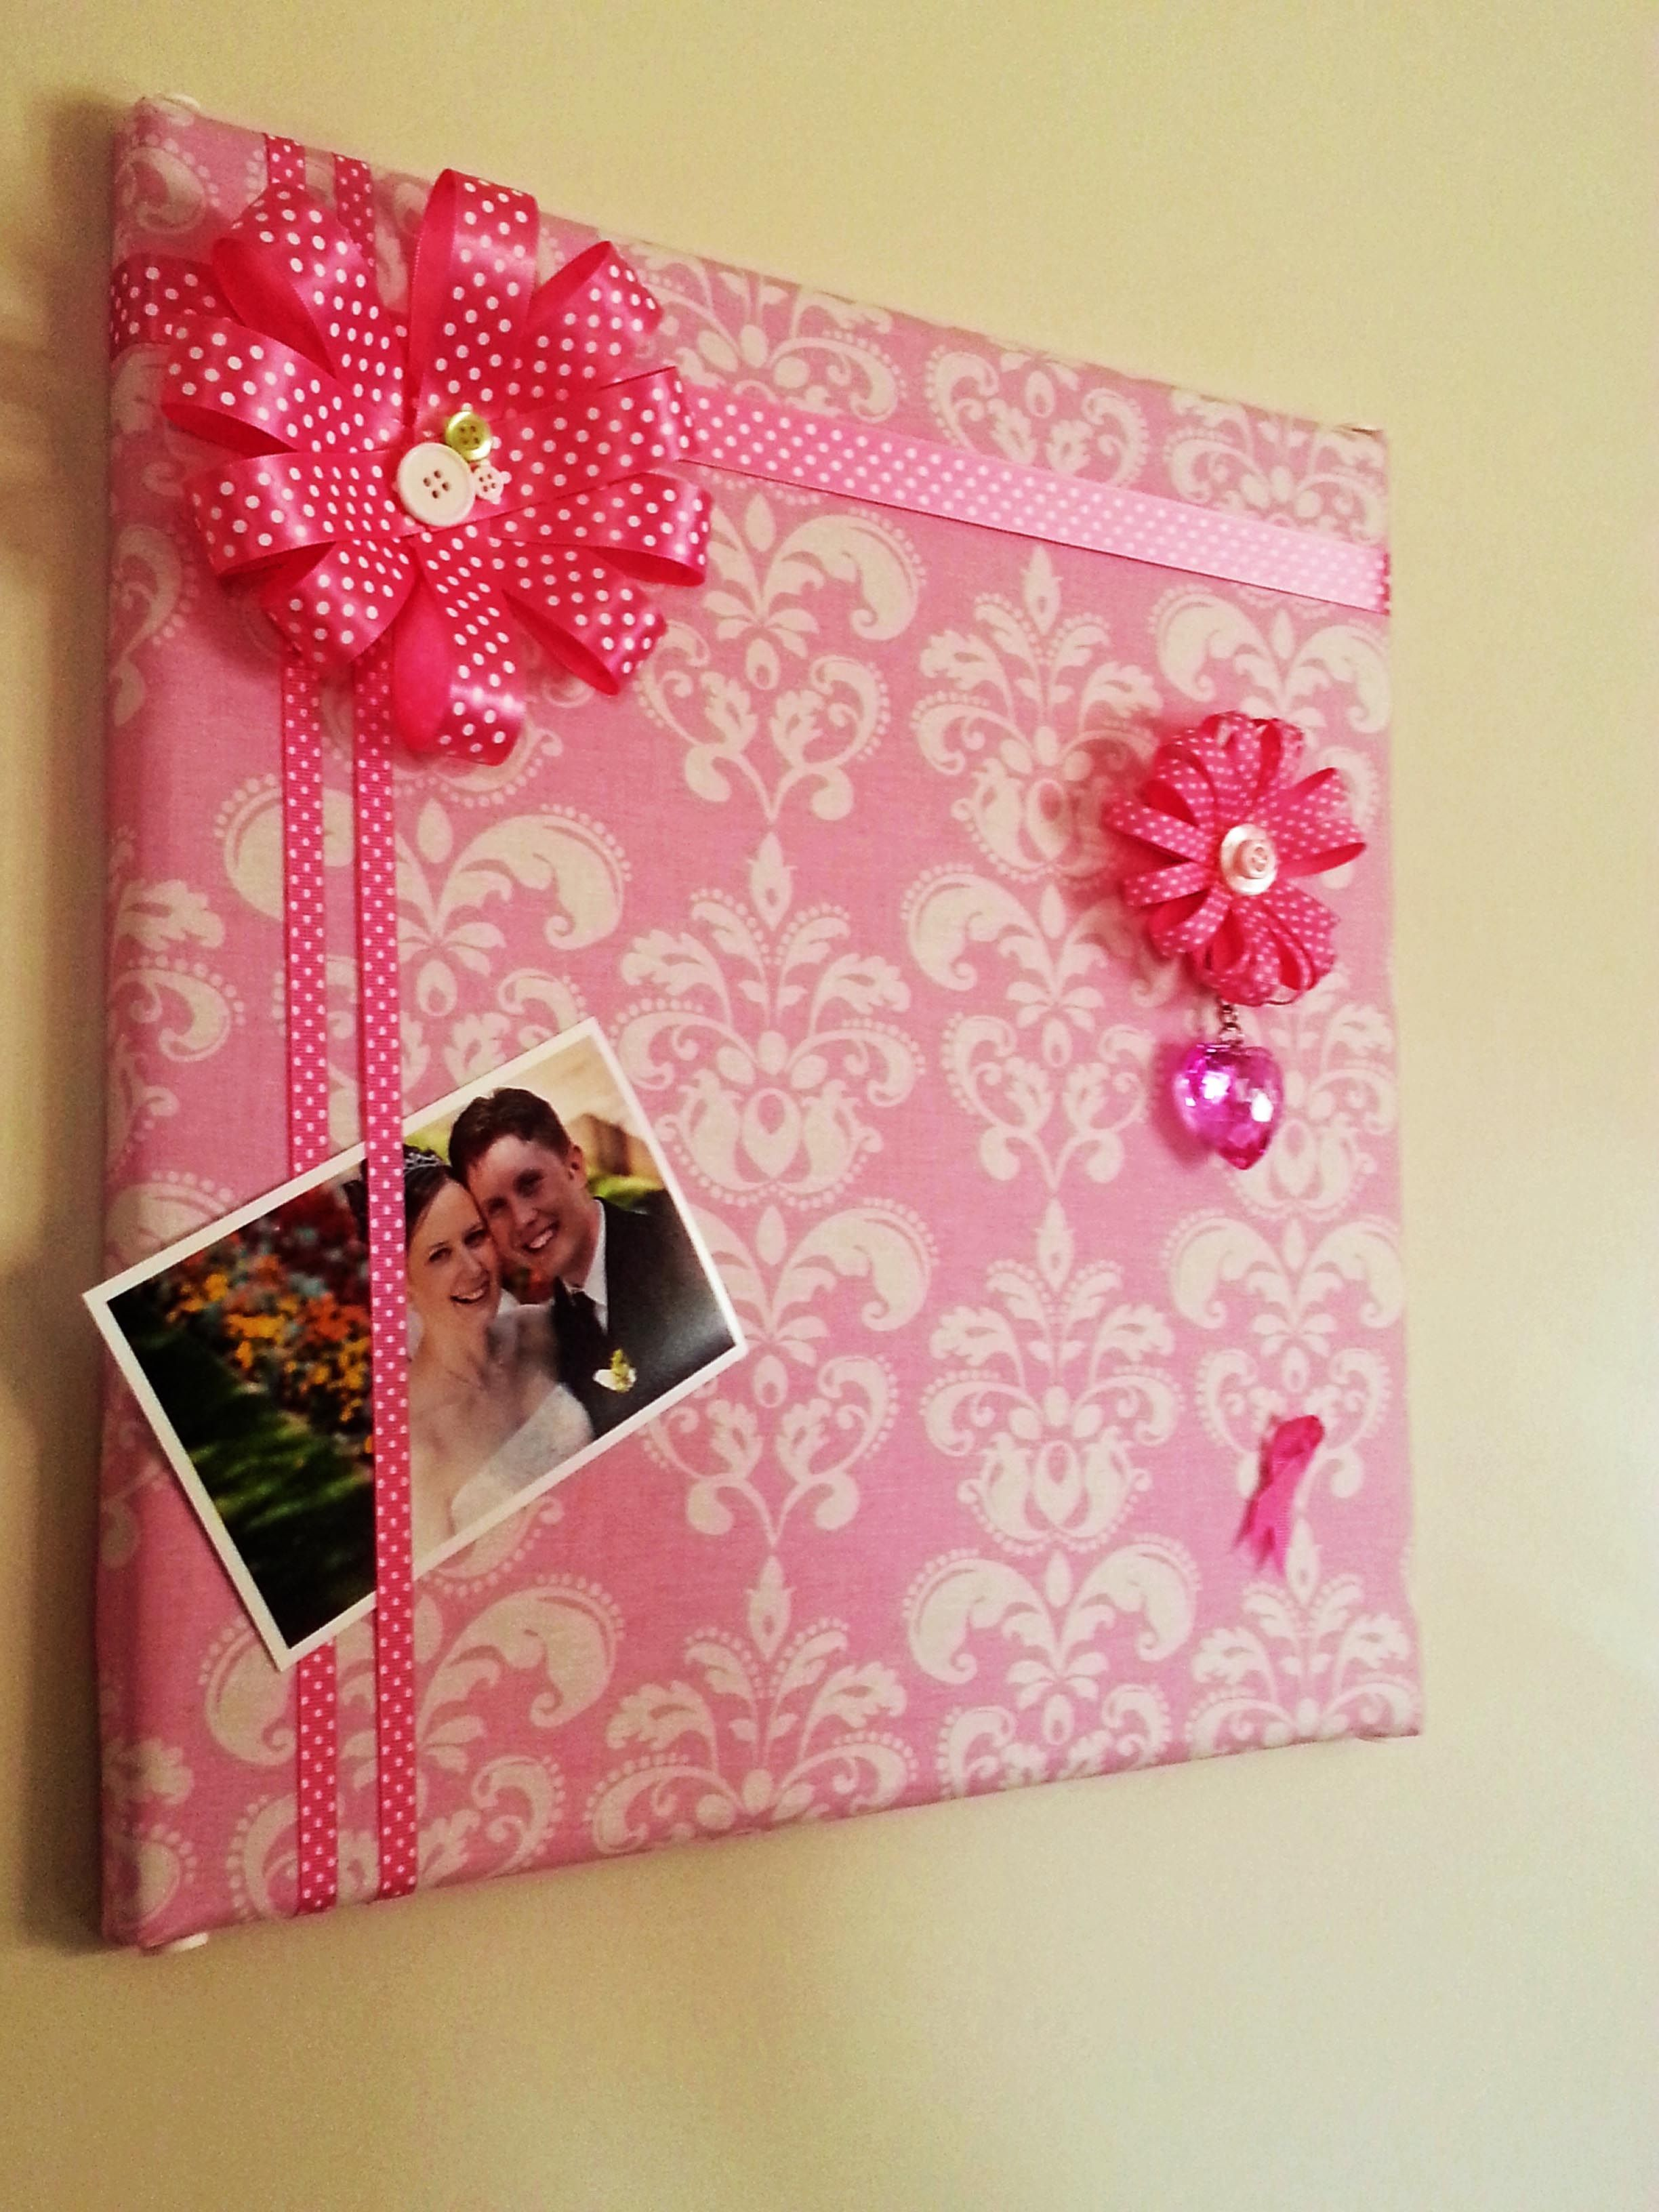 Diy - Cork Board Design With Ribbon Flower Push Pins